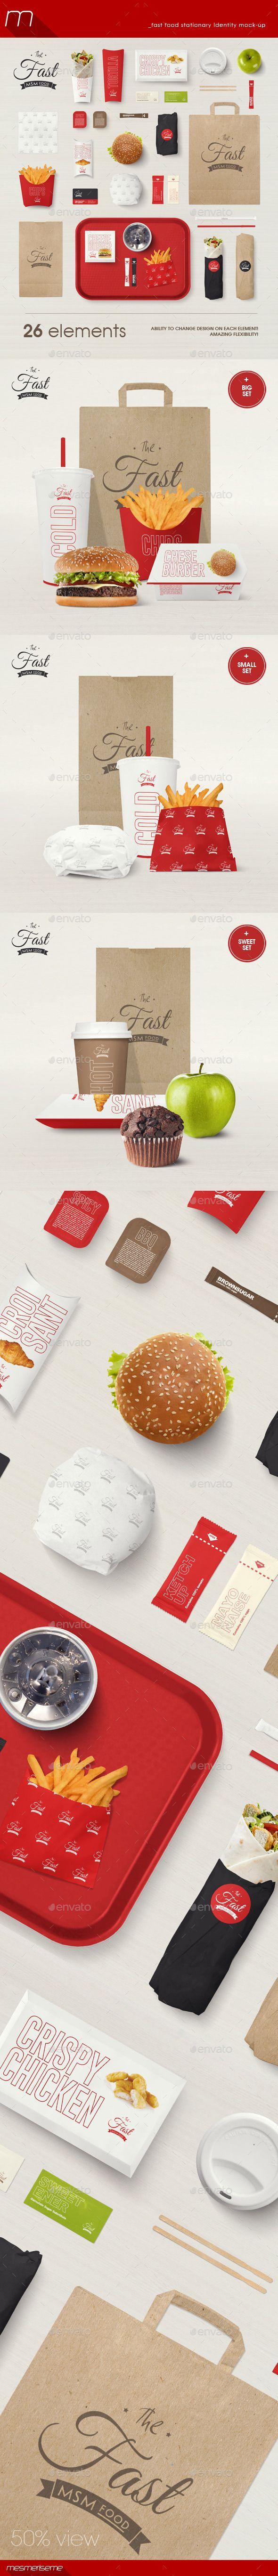 Fast Food Stationary Identity Mock-up | Download: http://graphicriver.net/item/fast-food-stationary-identity-mockup/9988270?ref=ksioks